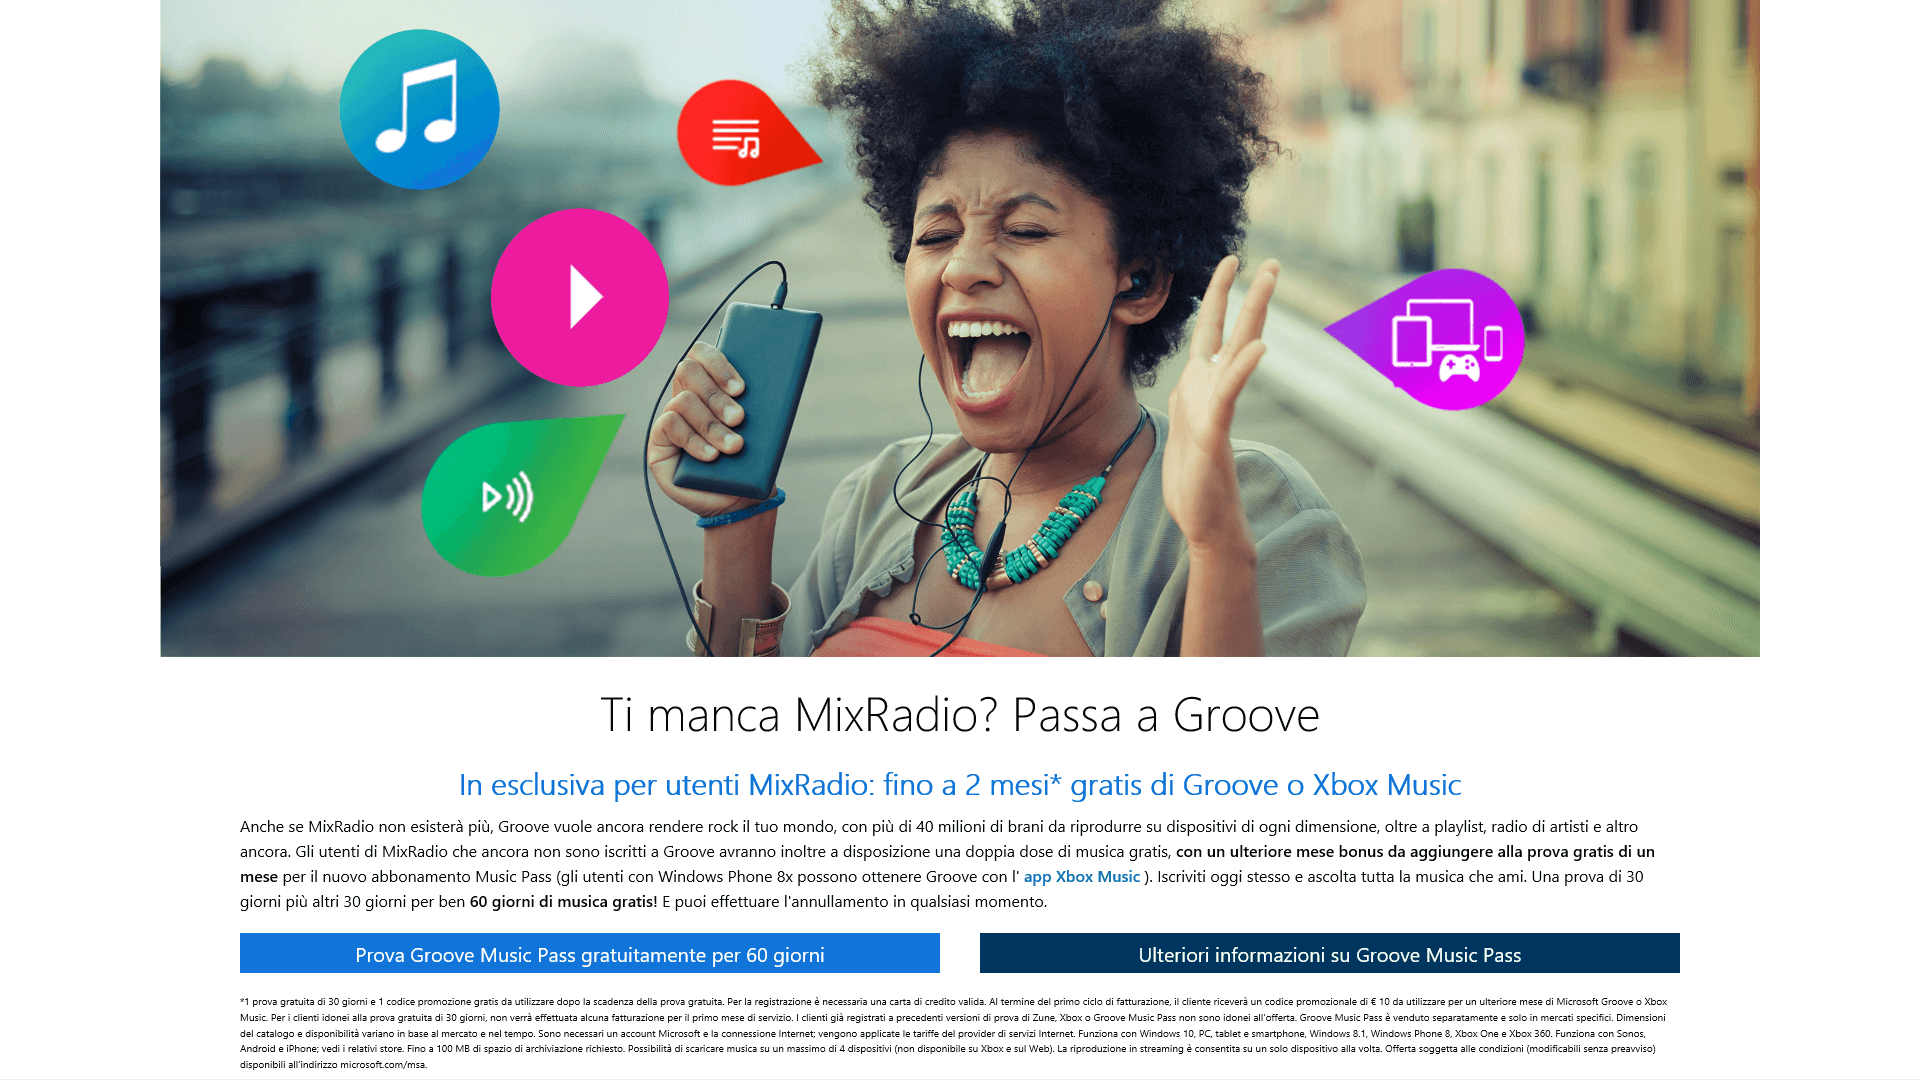 MixRadio - 2 mesi gratis Groove Music bis